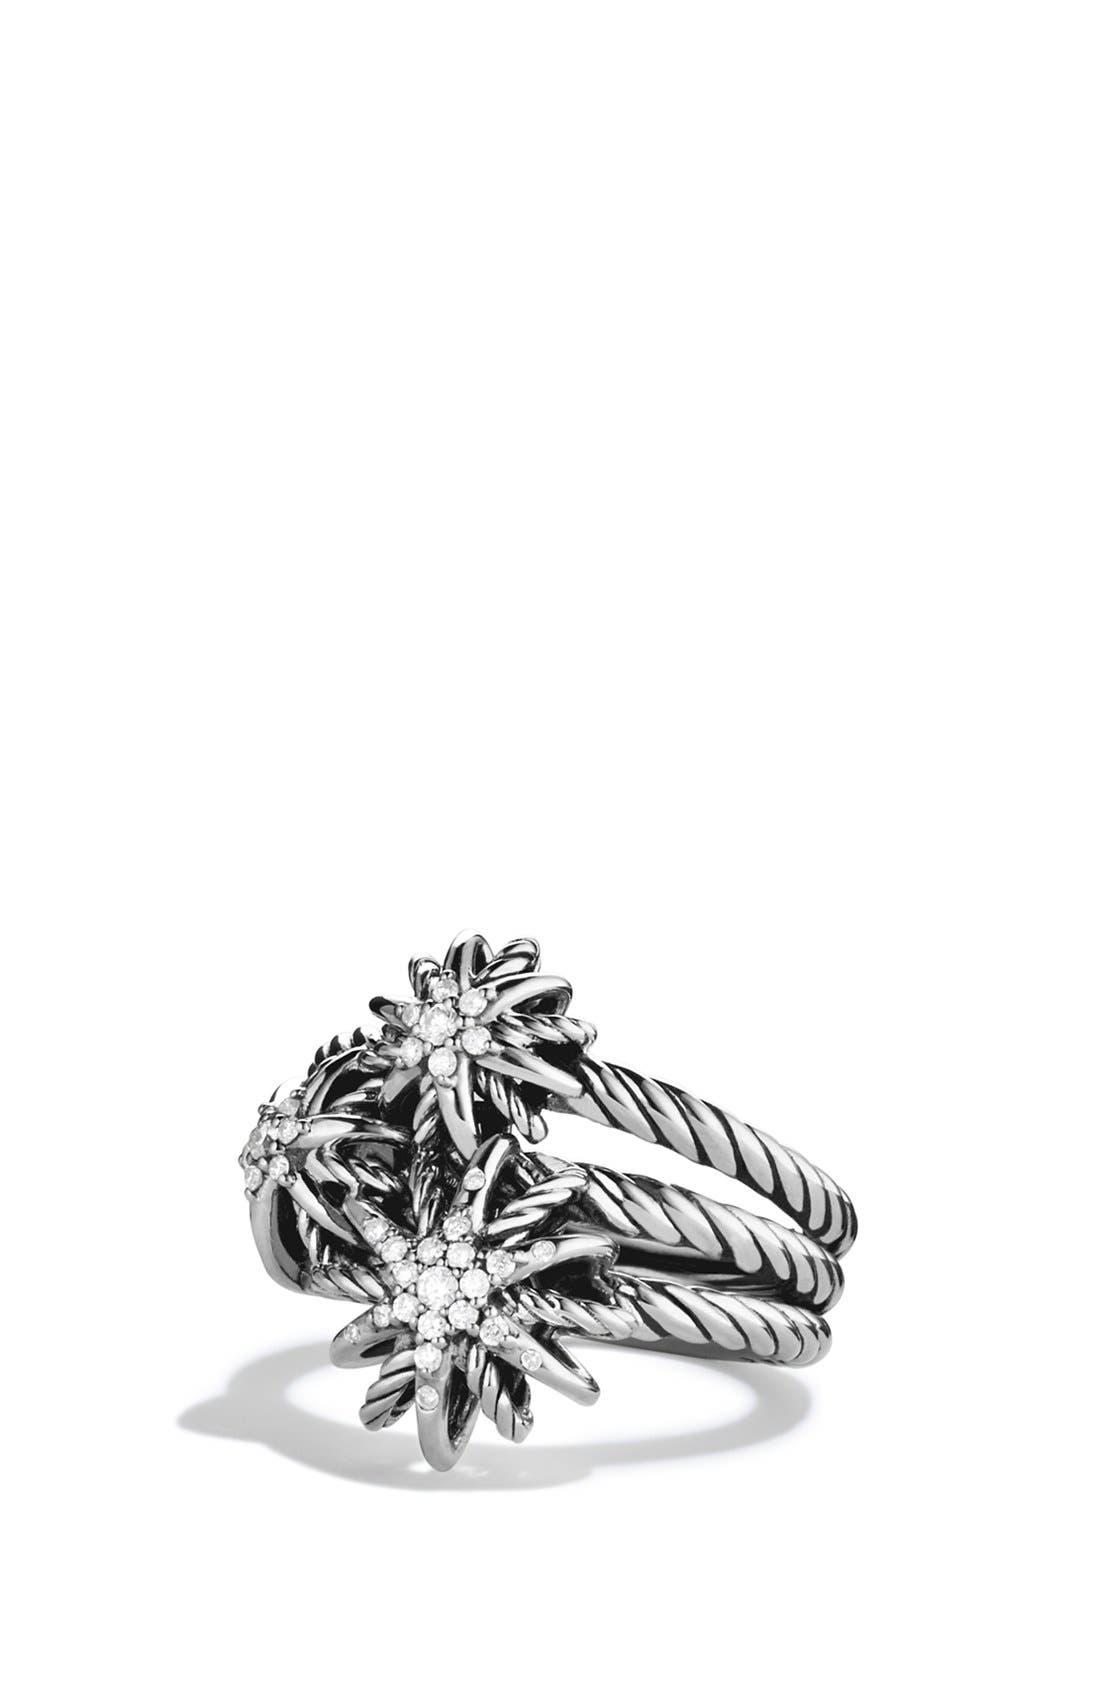 David Yurman 'Starburst' Cluster Ring with Diamonds